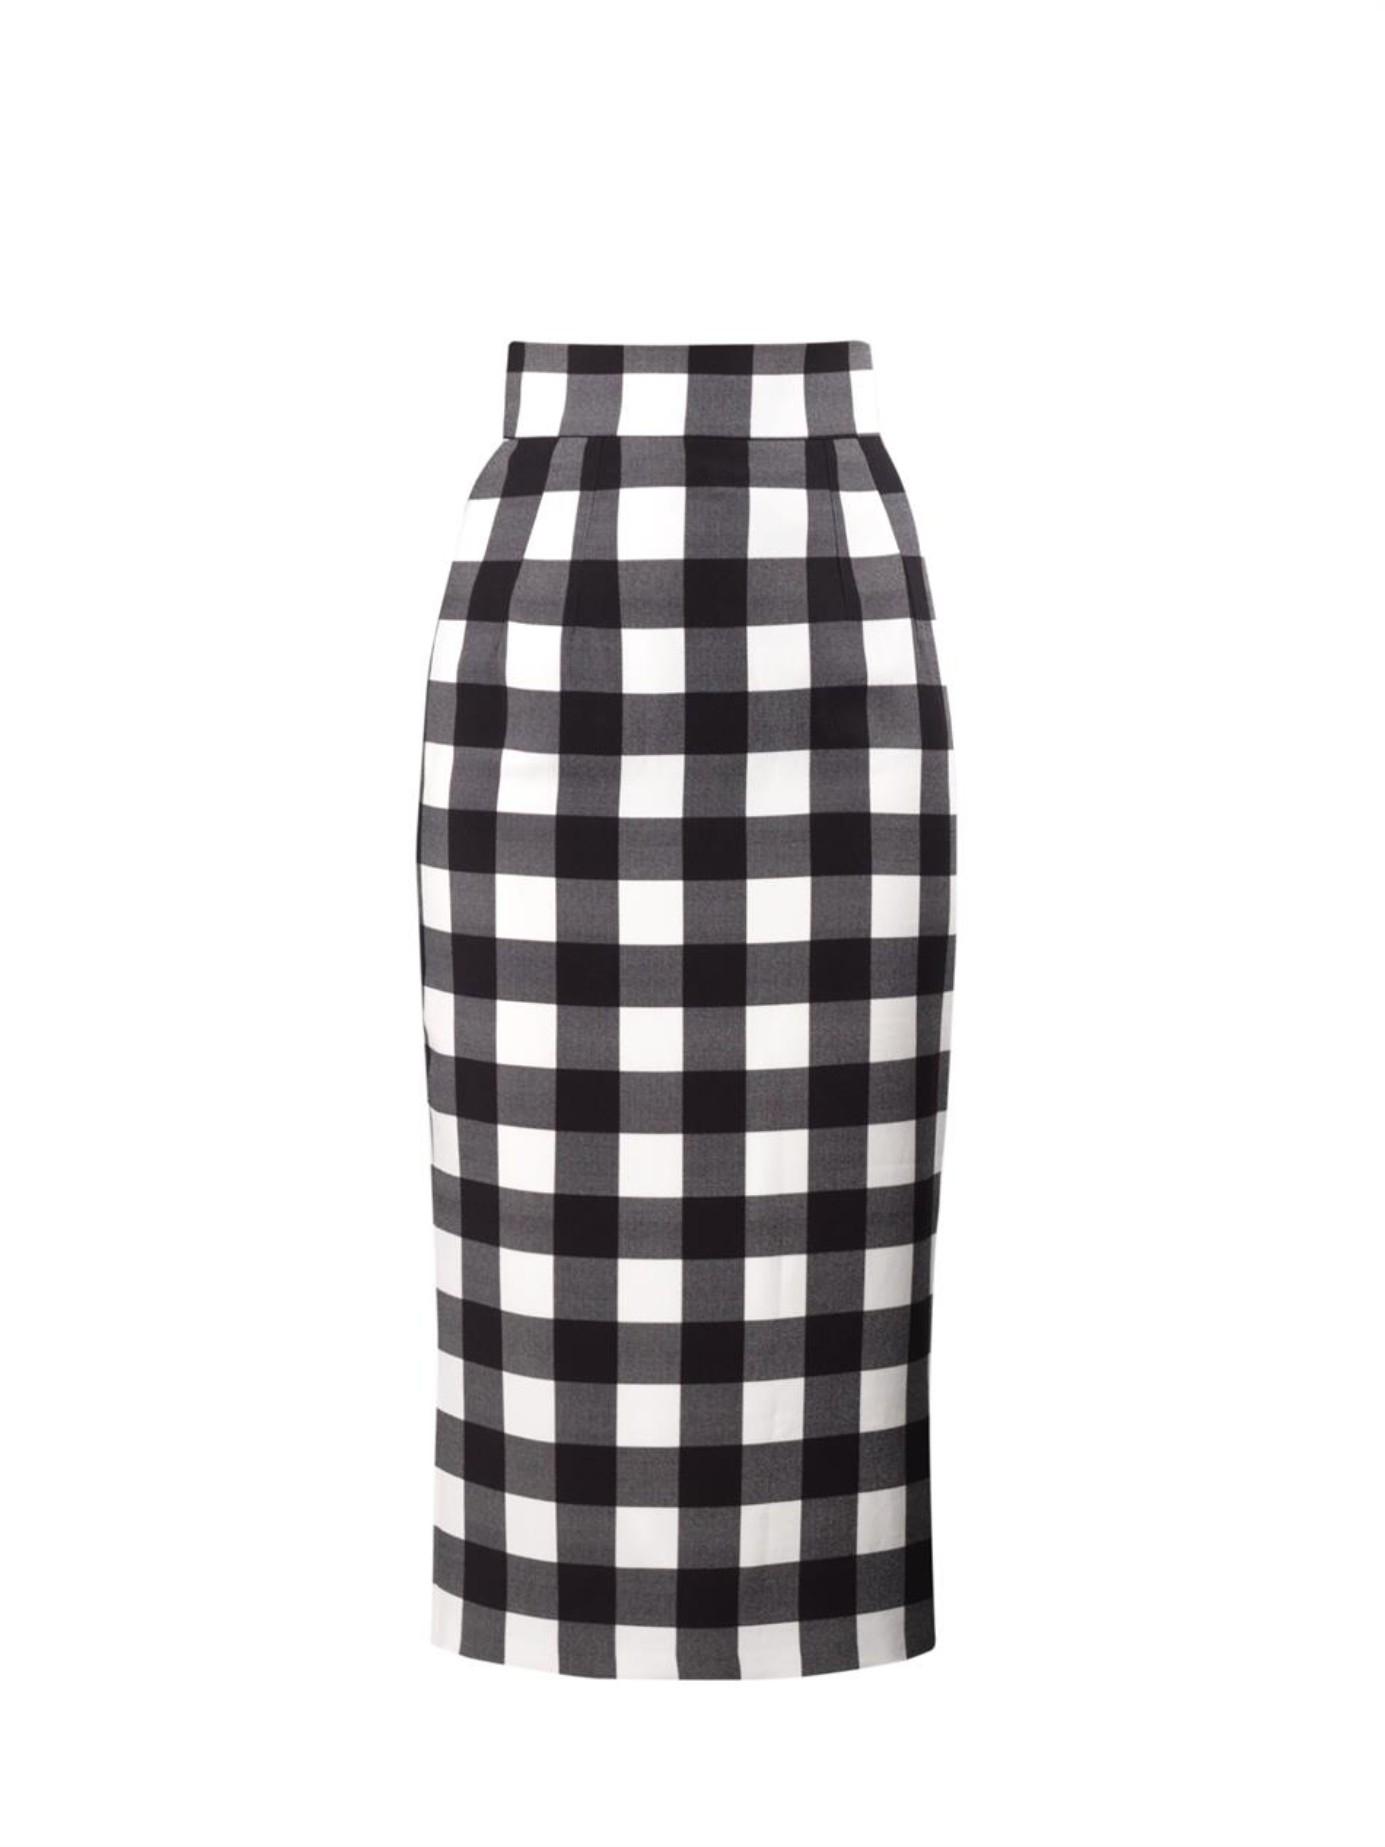 c34471c44 Dolce & Gabbana Vichy Gingham Pencil Skirt in Black - Lyst